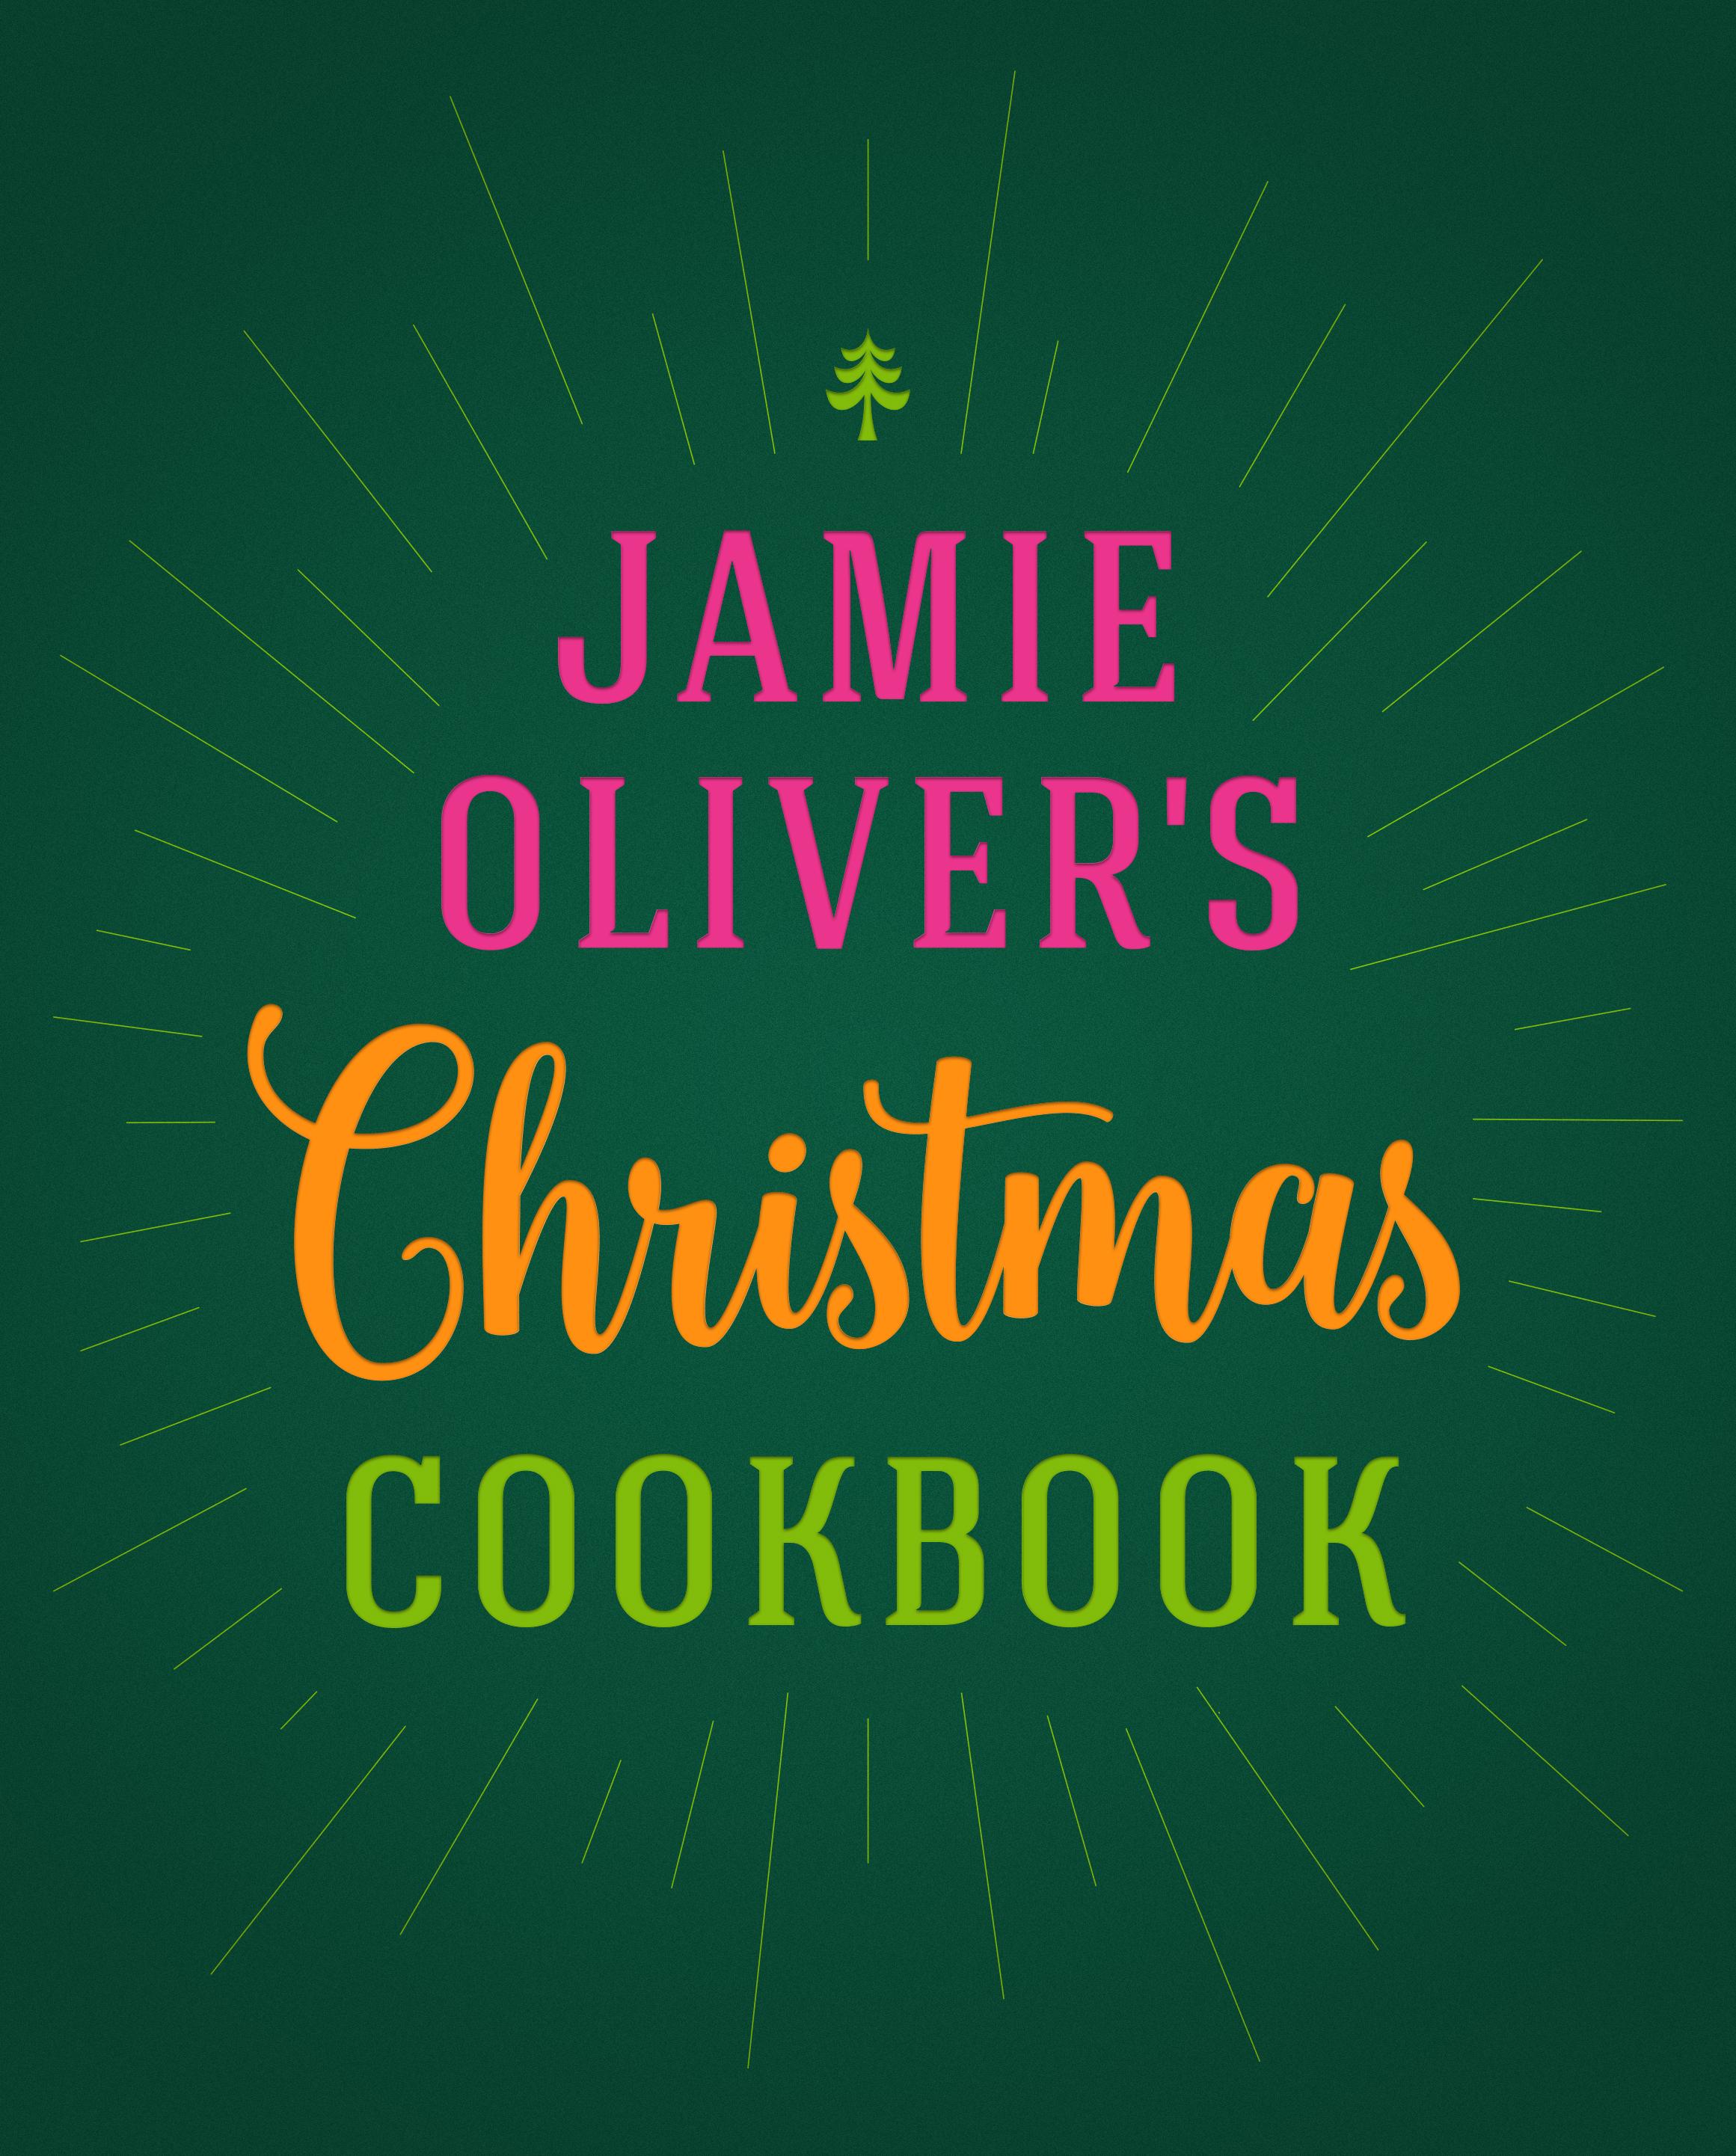 Cookbooks | Shop | Jamie Oliver